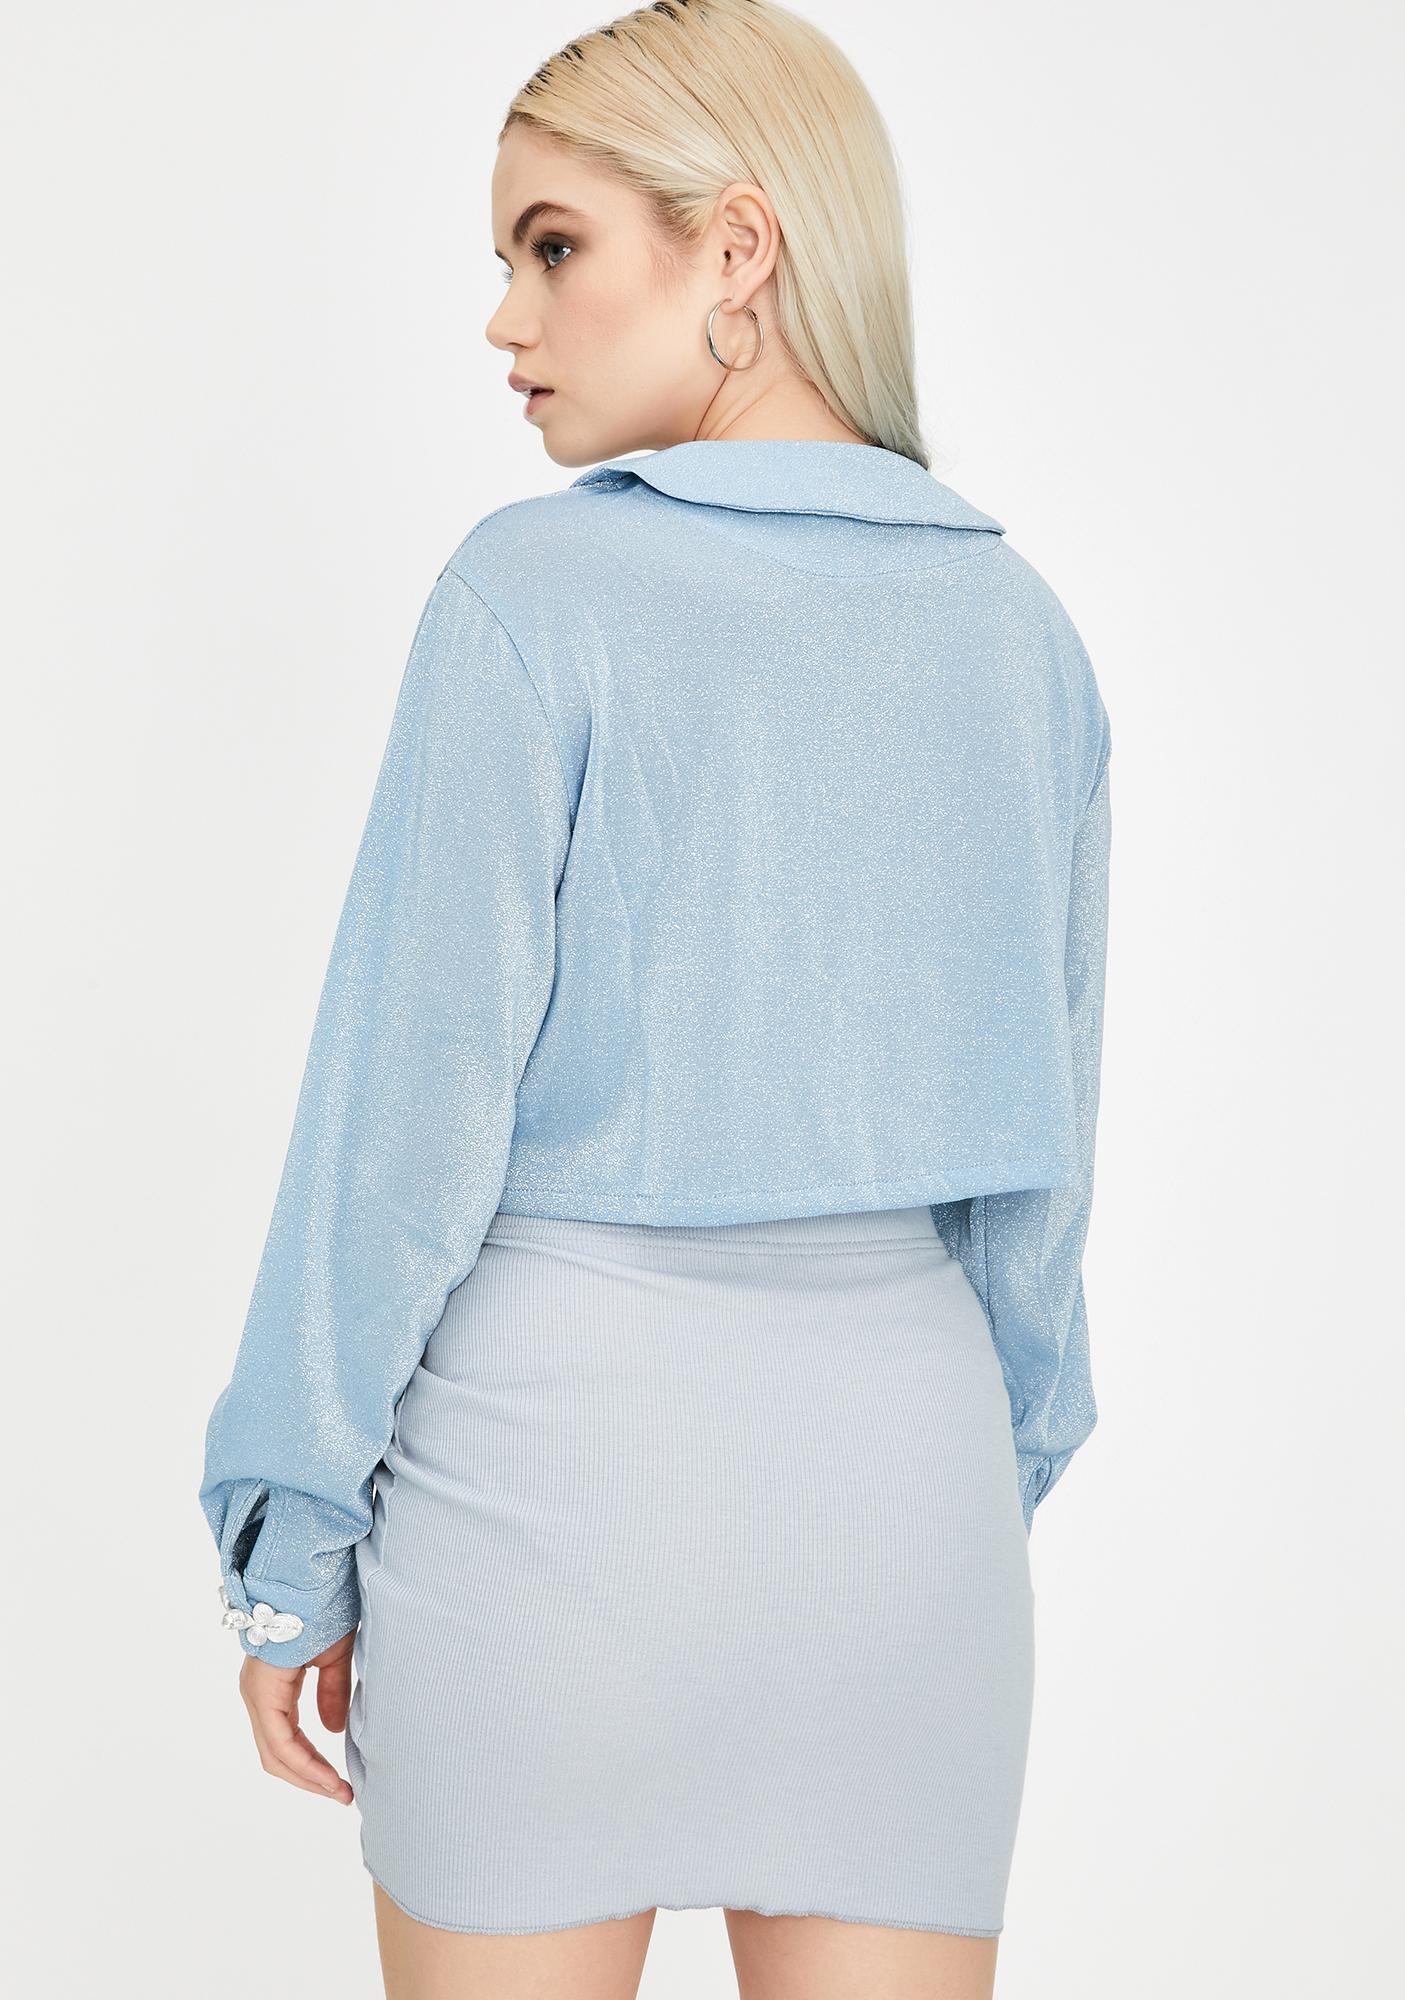 ZEMETA Blue One Way String Mini Skirt